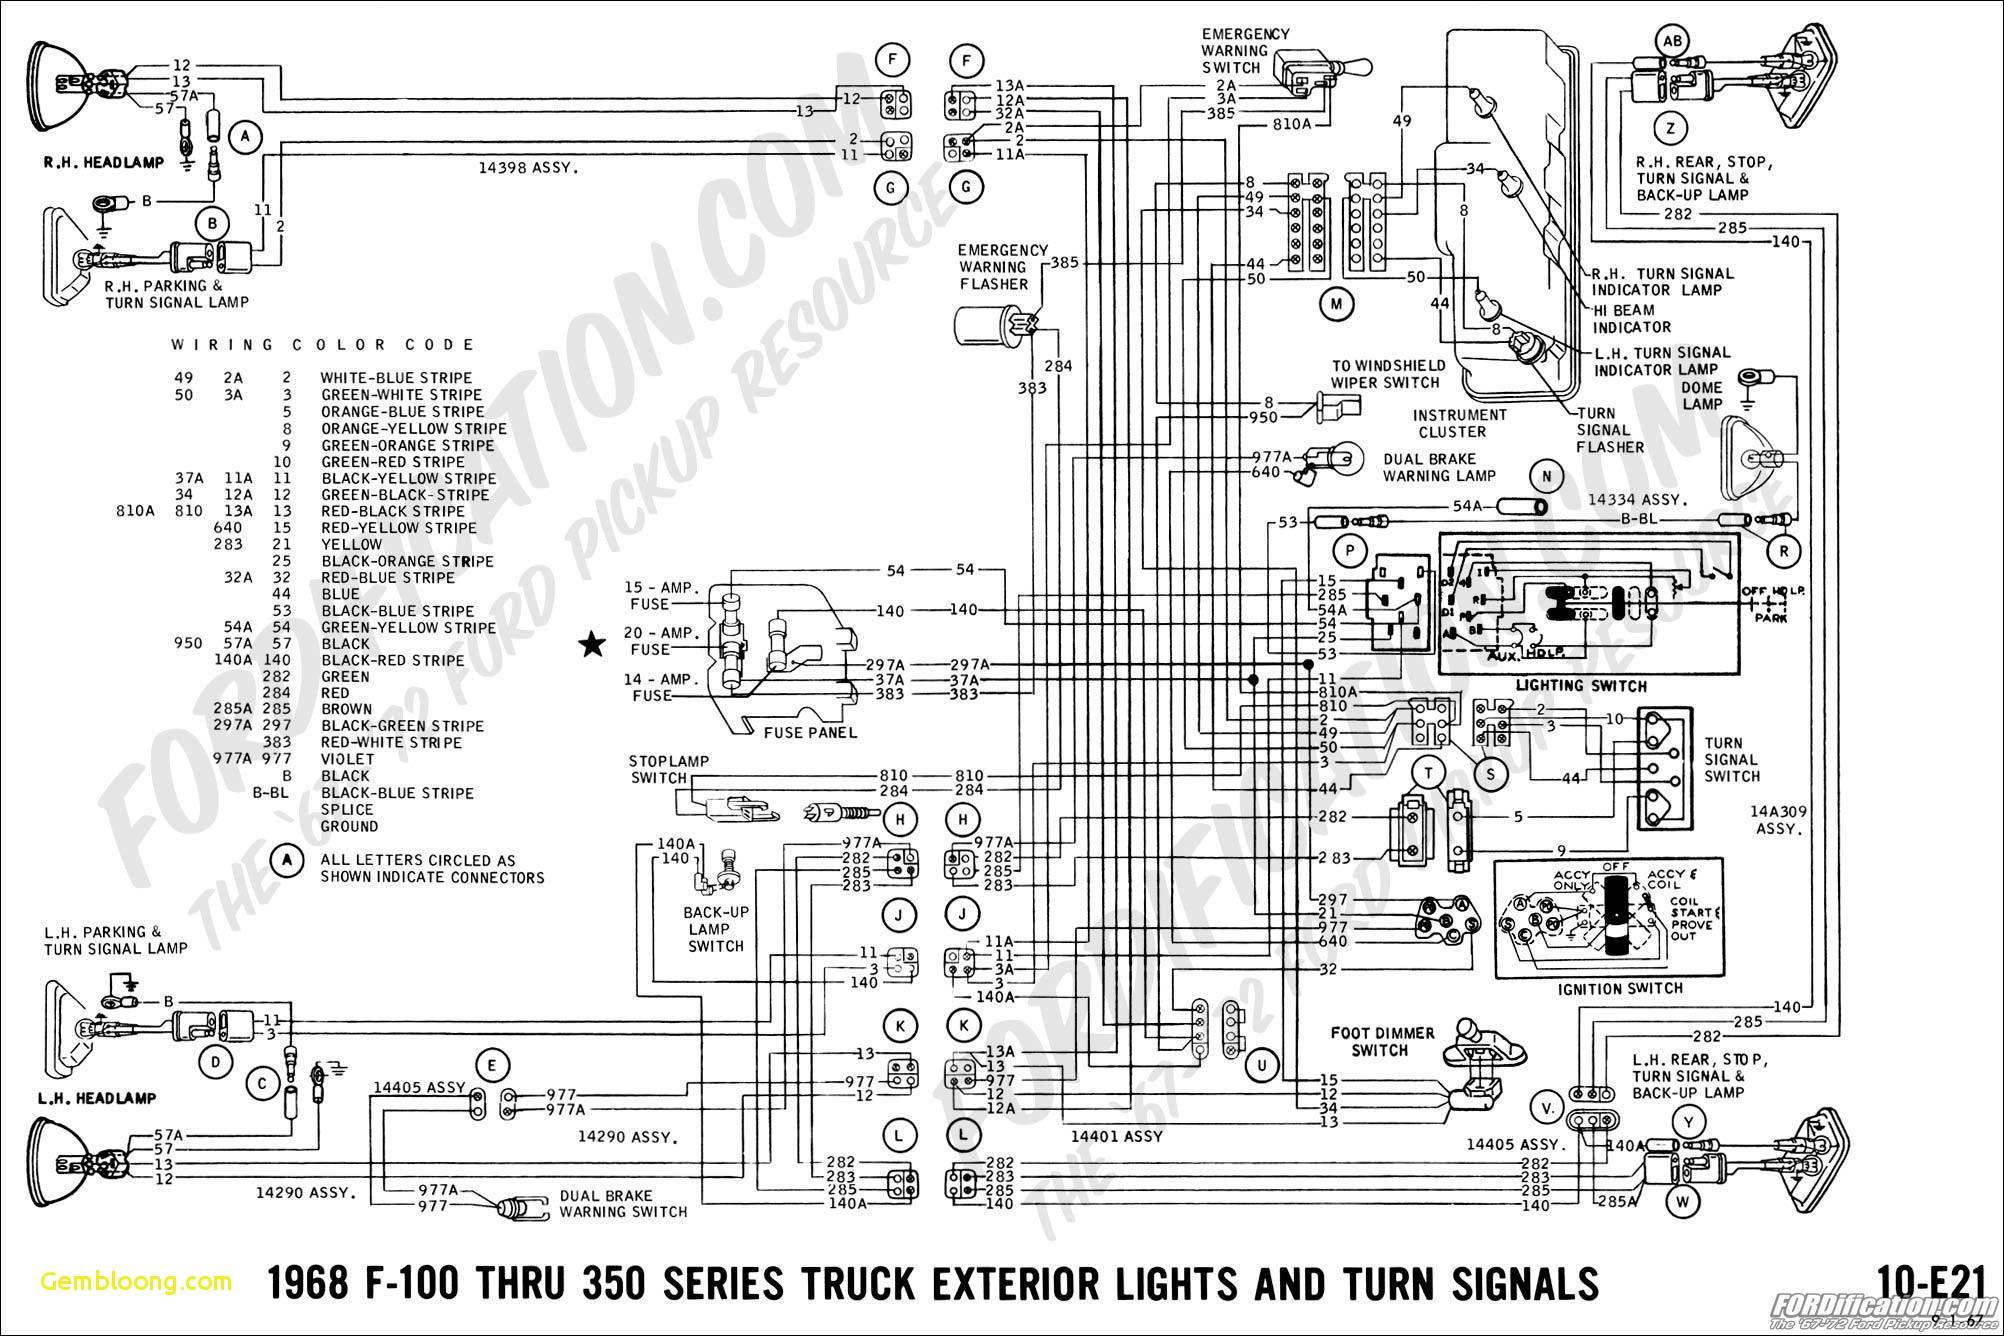 1979 ford f 250 wiring diagram download wiring diagram 1971 Ford Pinto Wiring Diagram 1970 ford f 250 wiring diagram 2 jdw linda cosmetics de \\u2022wiring diagram 1970 ford f 100 custom wiring diagram rh 37 ansolsolder co 1970 ford f100